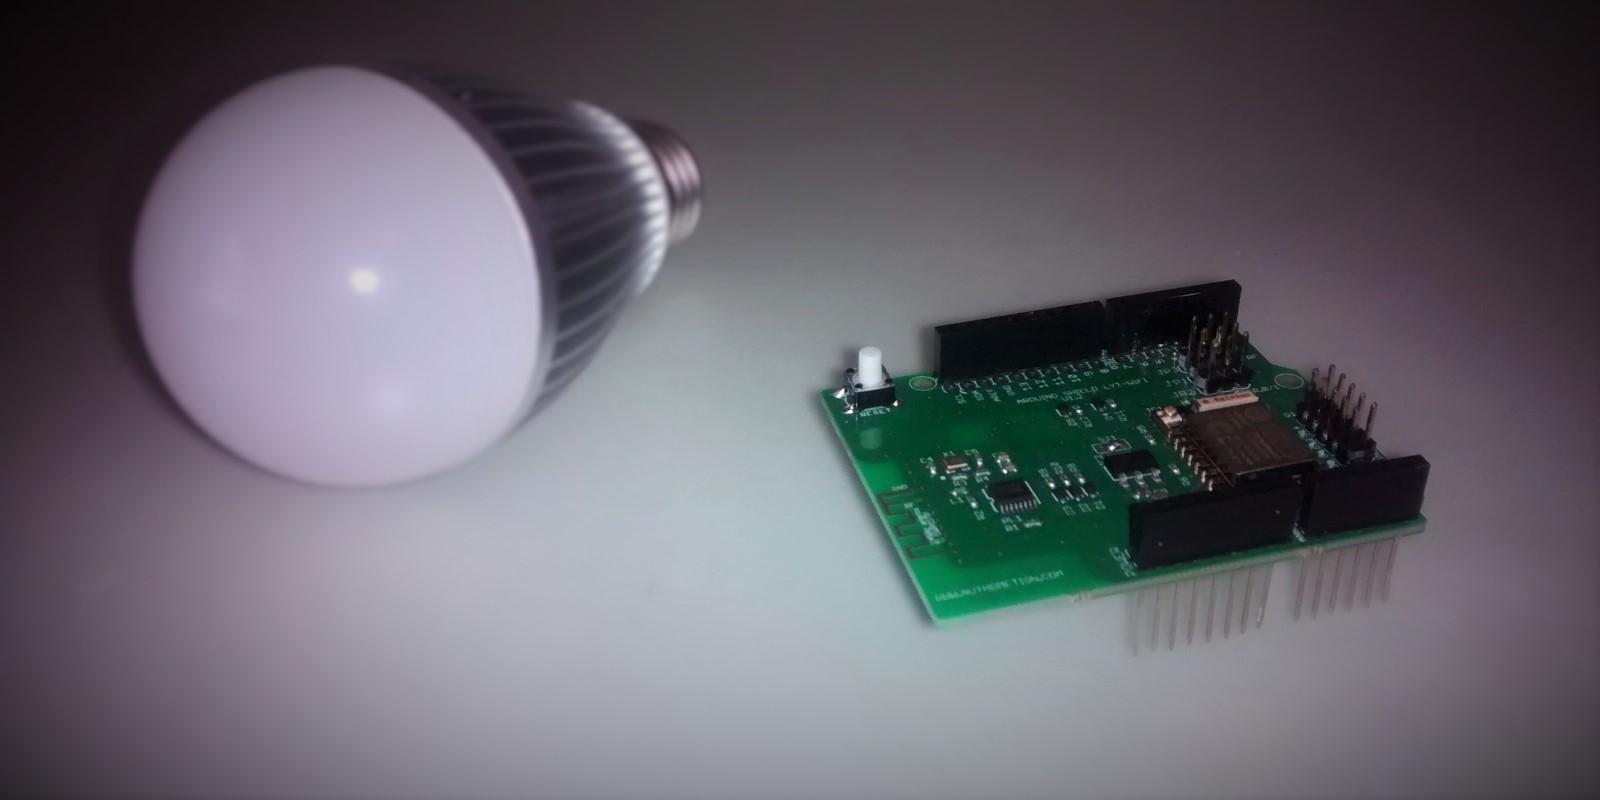 Howto make a remote control led bulb do it yourself india magazine howto make a remote control led bulb solutioingenieria Choice Image